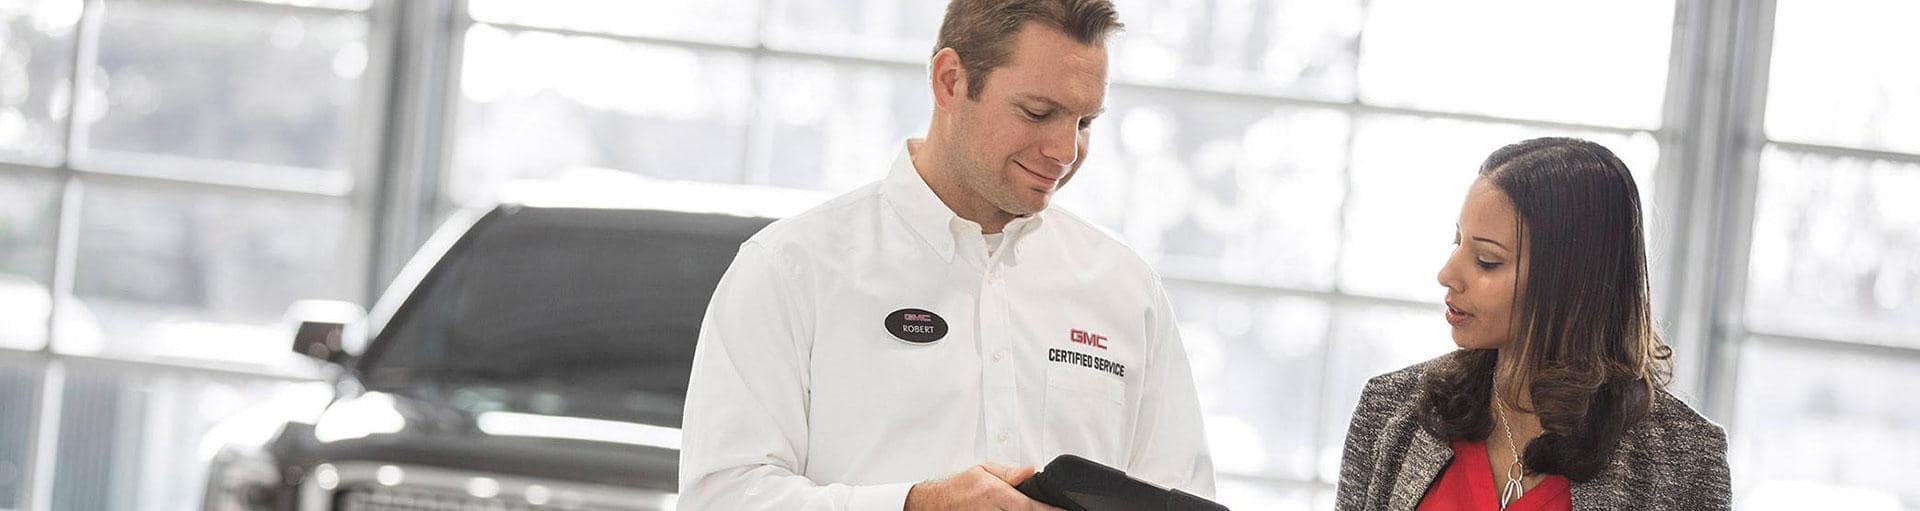 Cutter Buick GMC Service Specials